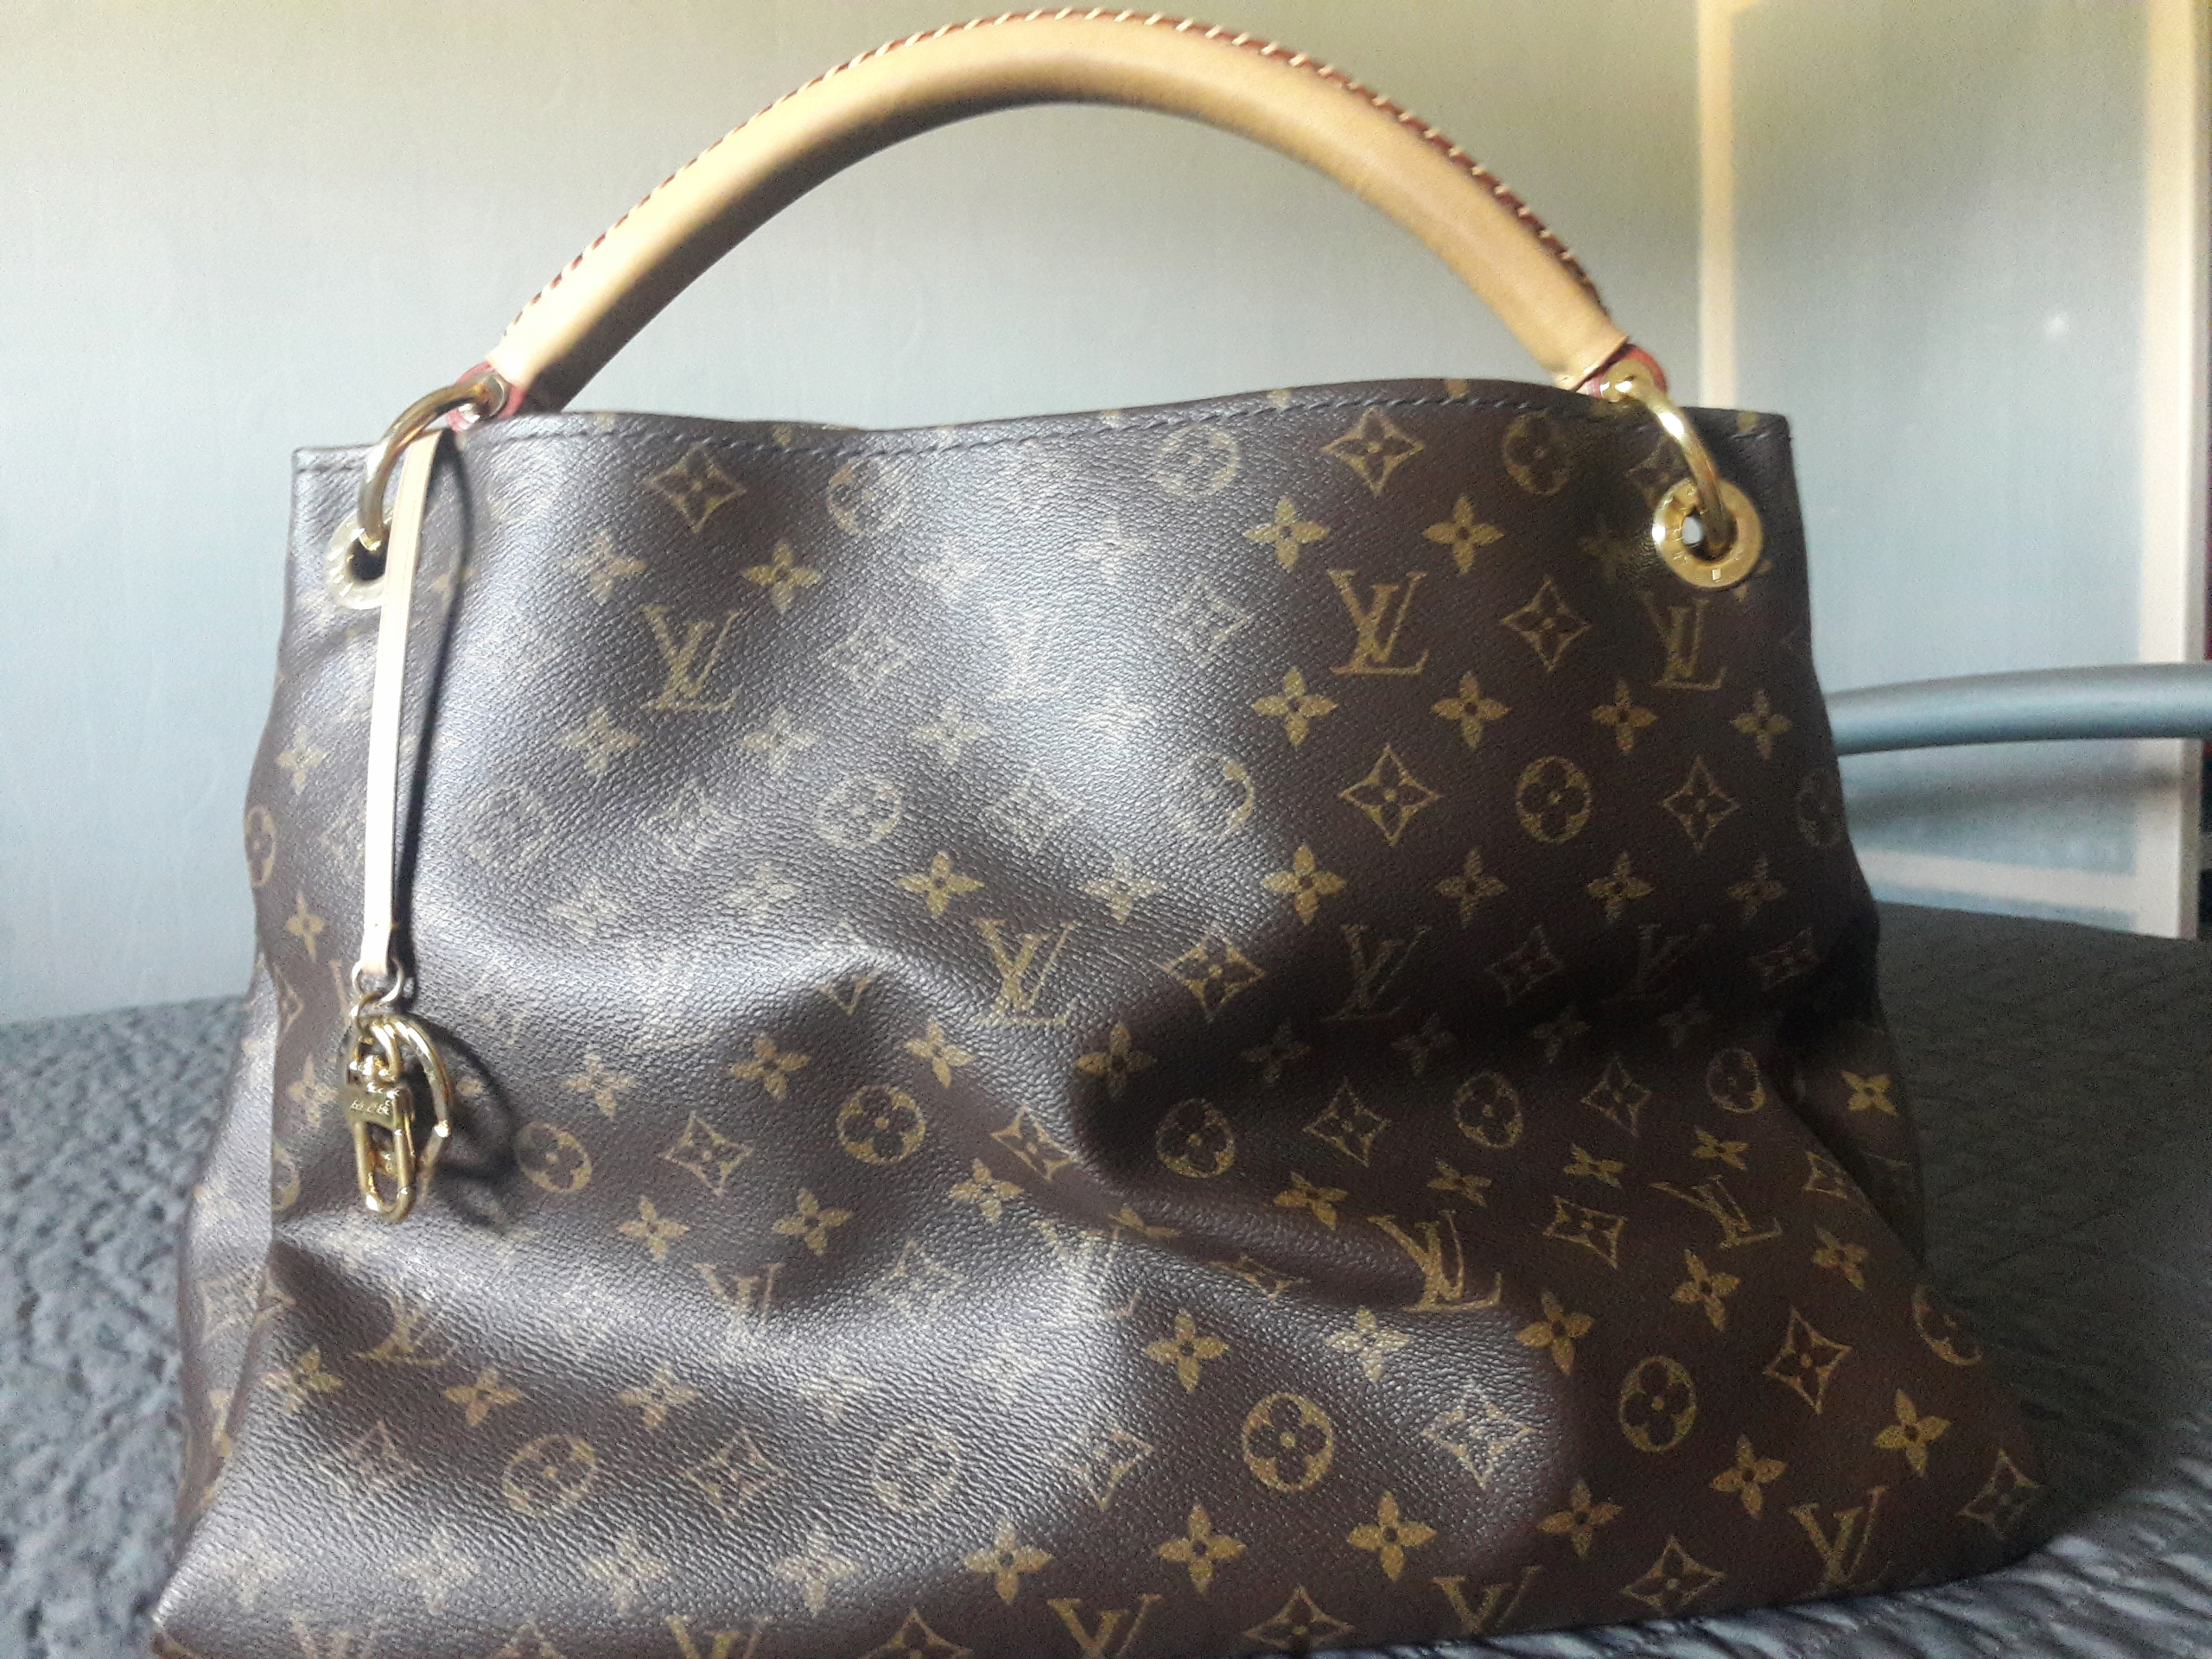 289753854a1e2 Torebka Louis Vuitton artsy mm 100 % oryginalna - 7652239137 ...